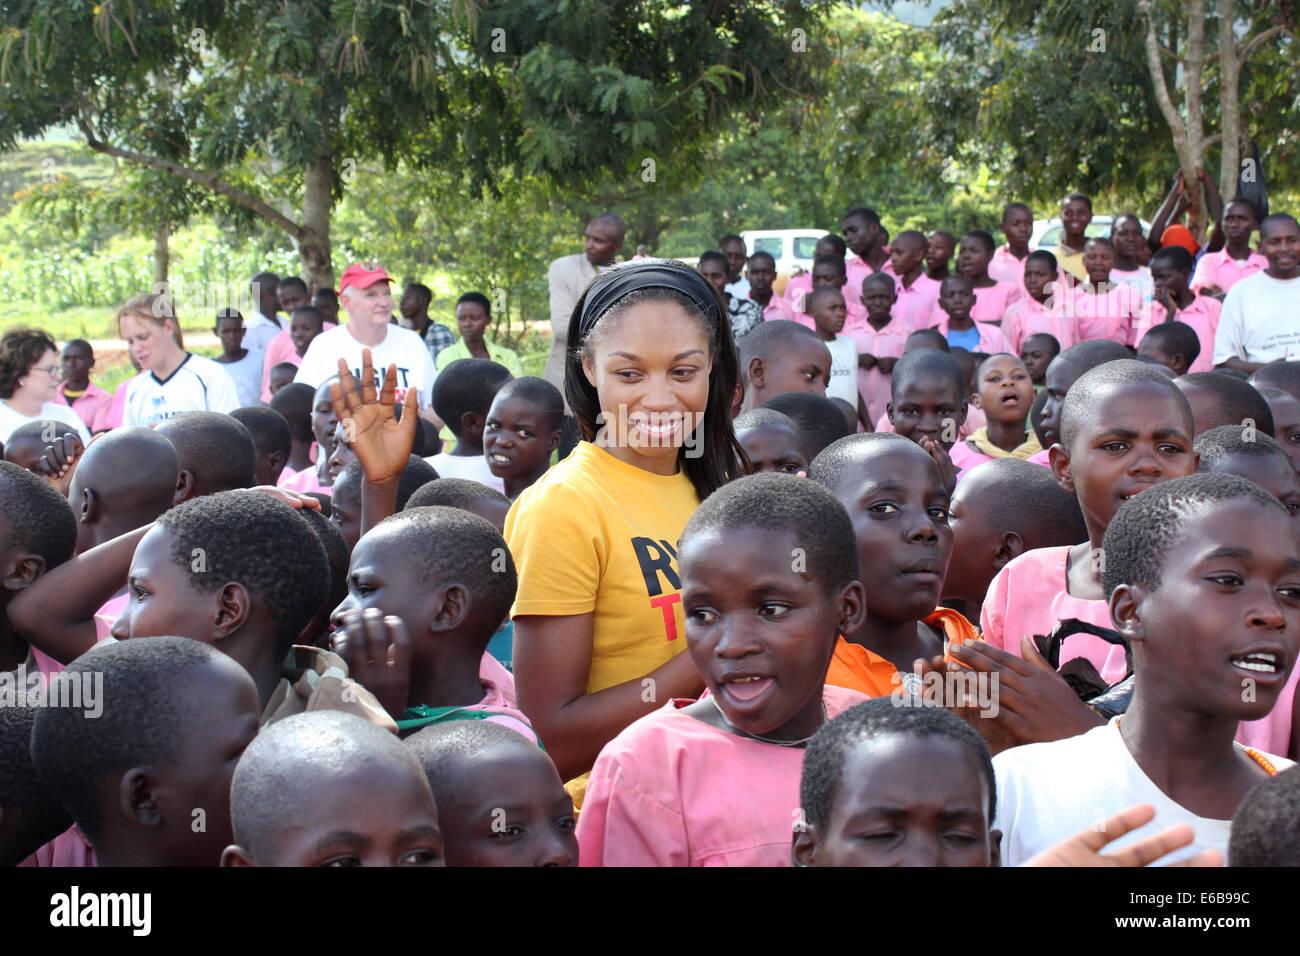 US athletics star Allyson Felix visits to disadvantaged children in school at Oruchinga refugee Settlement in Uganda - Stock Image